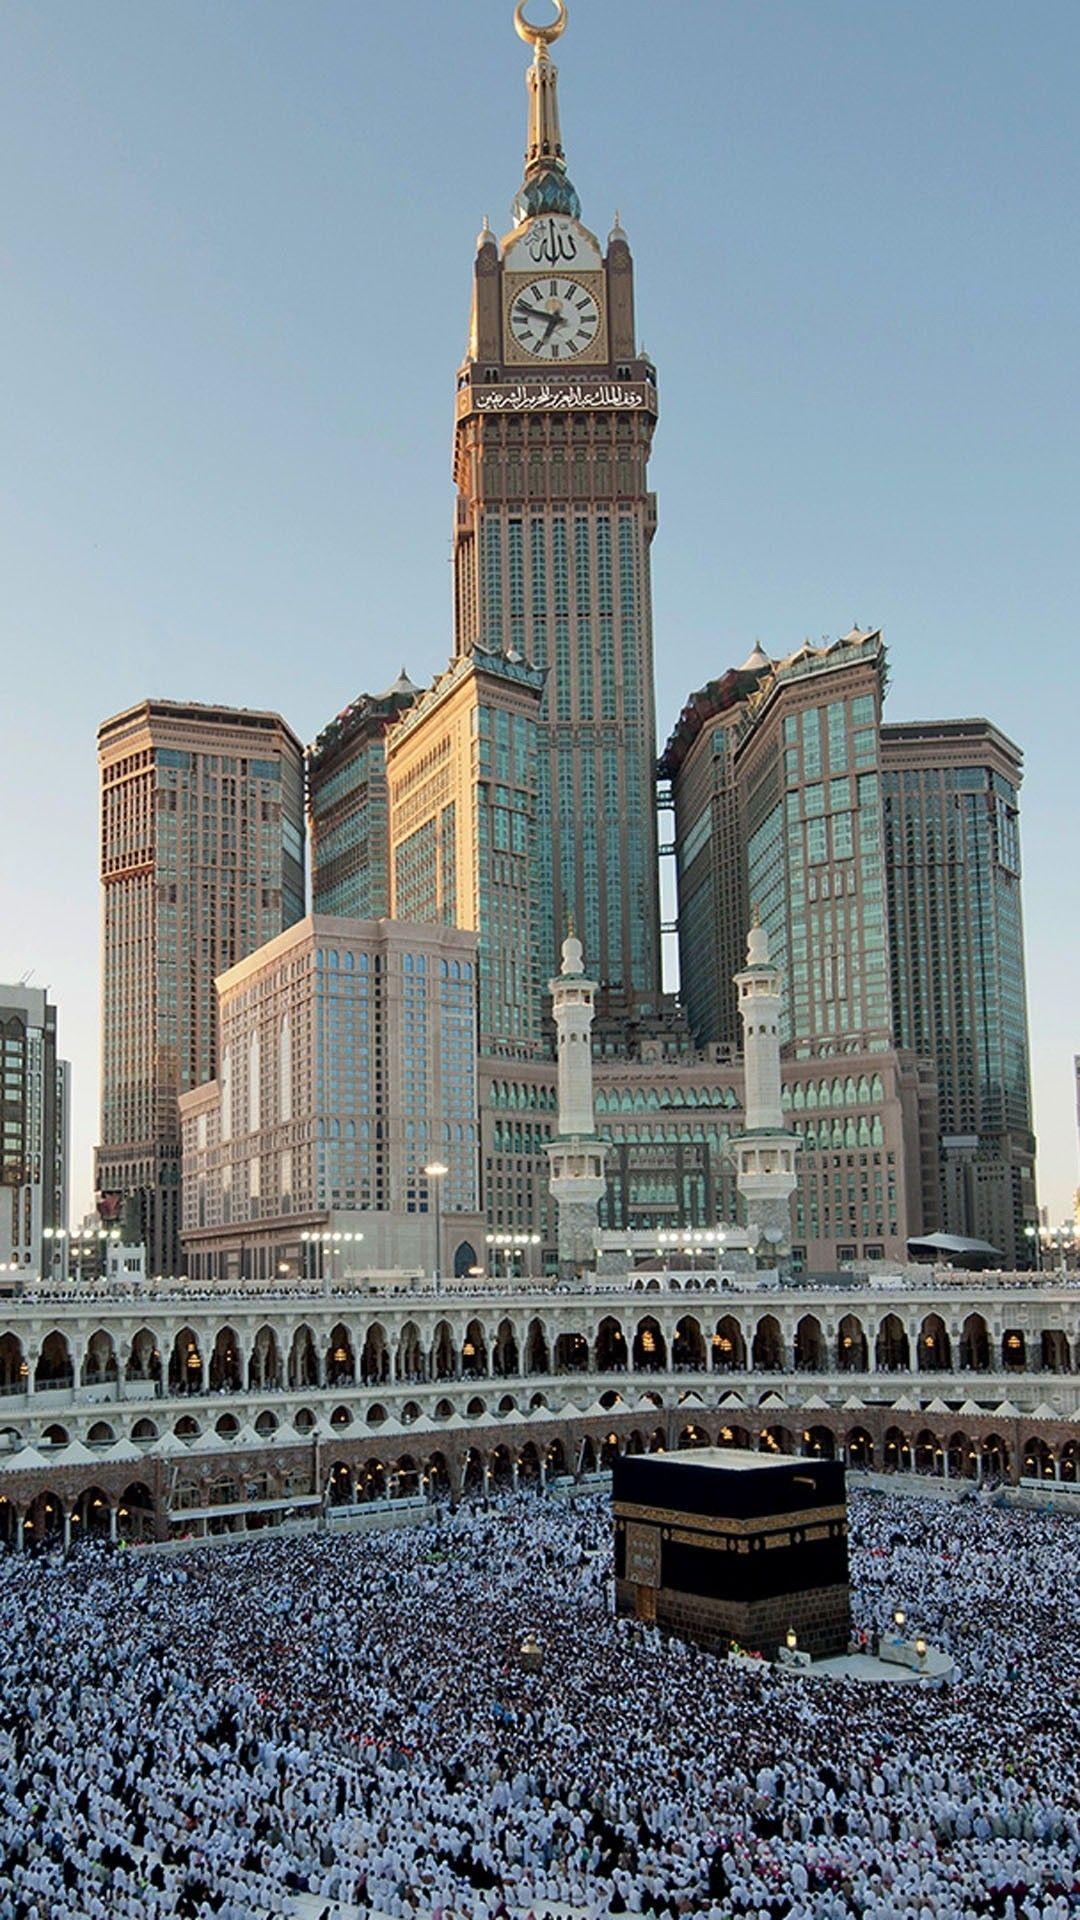 1080x1920 Download Makkah Clock Royal Tower 1080 X 1920 Wallpapers 4528727 Islamic Mekkah Tower Mobile9 Mekah Pemandangan Latar Belakang